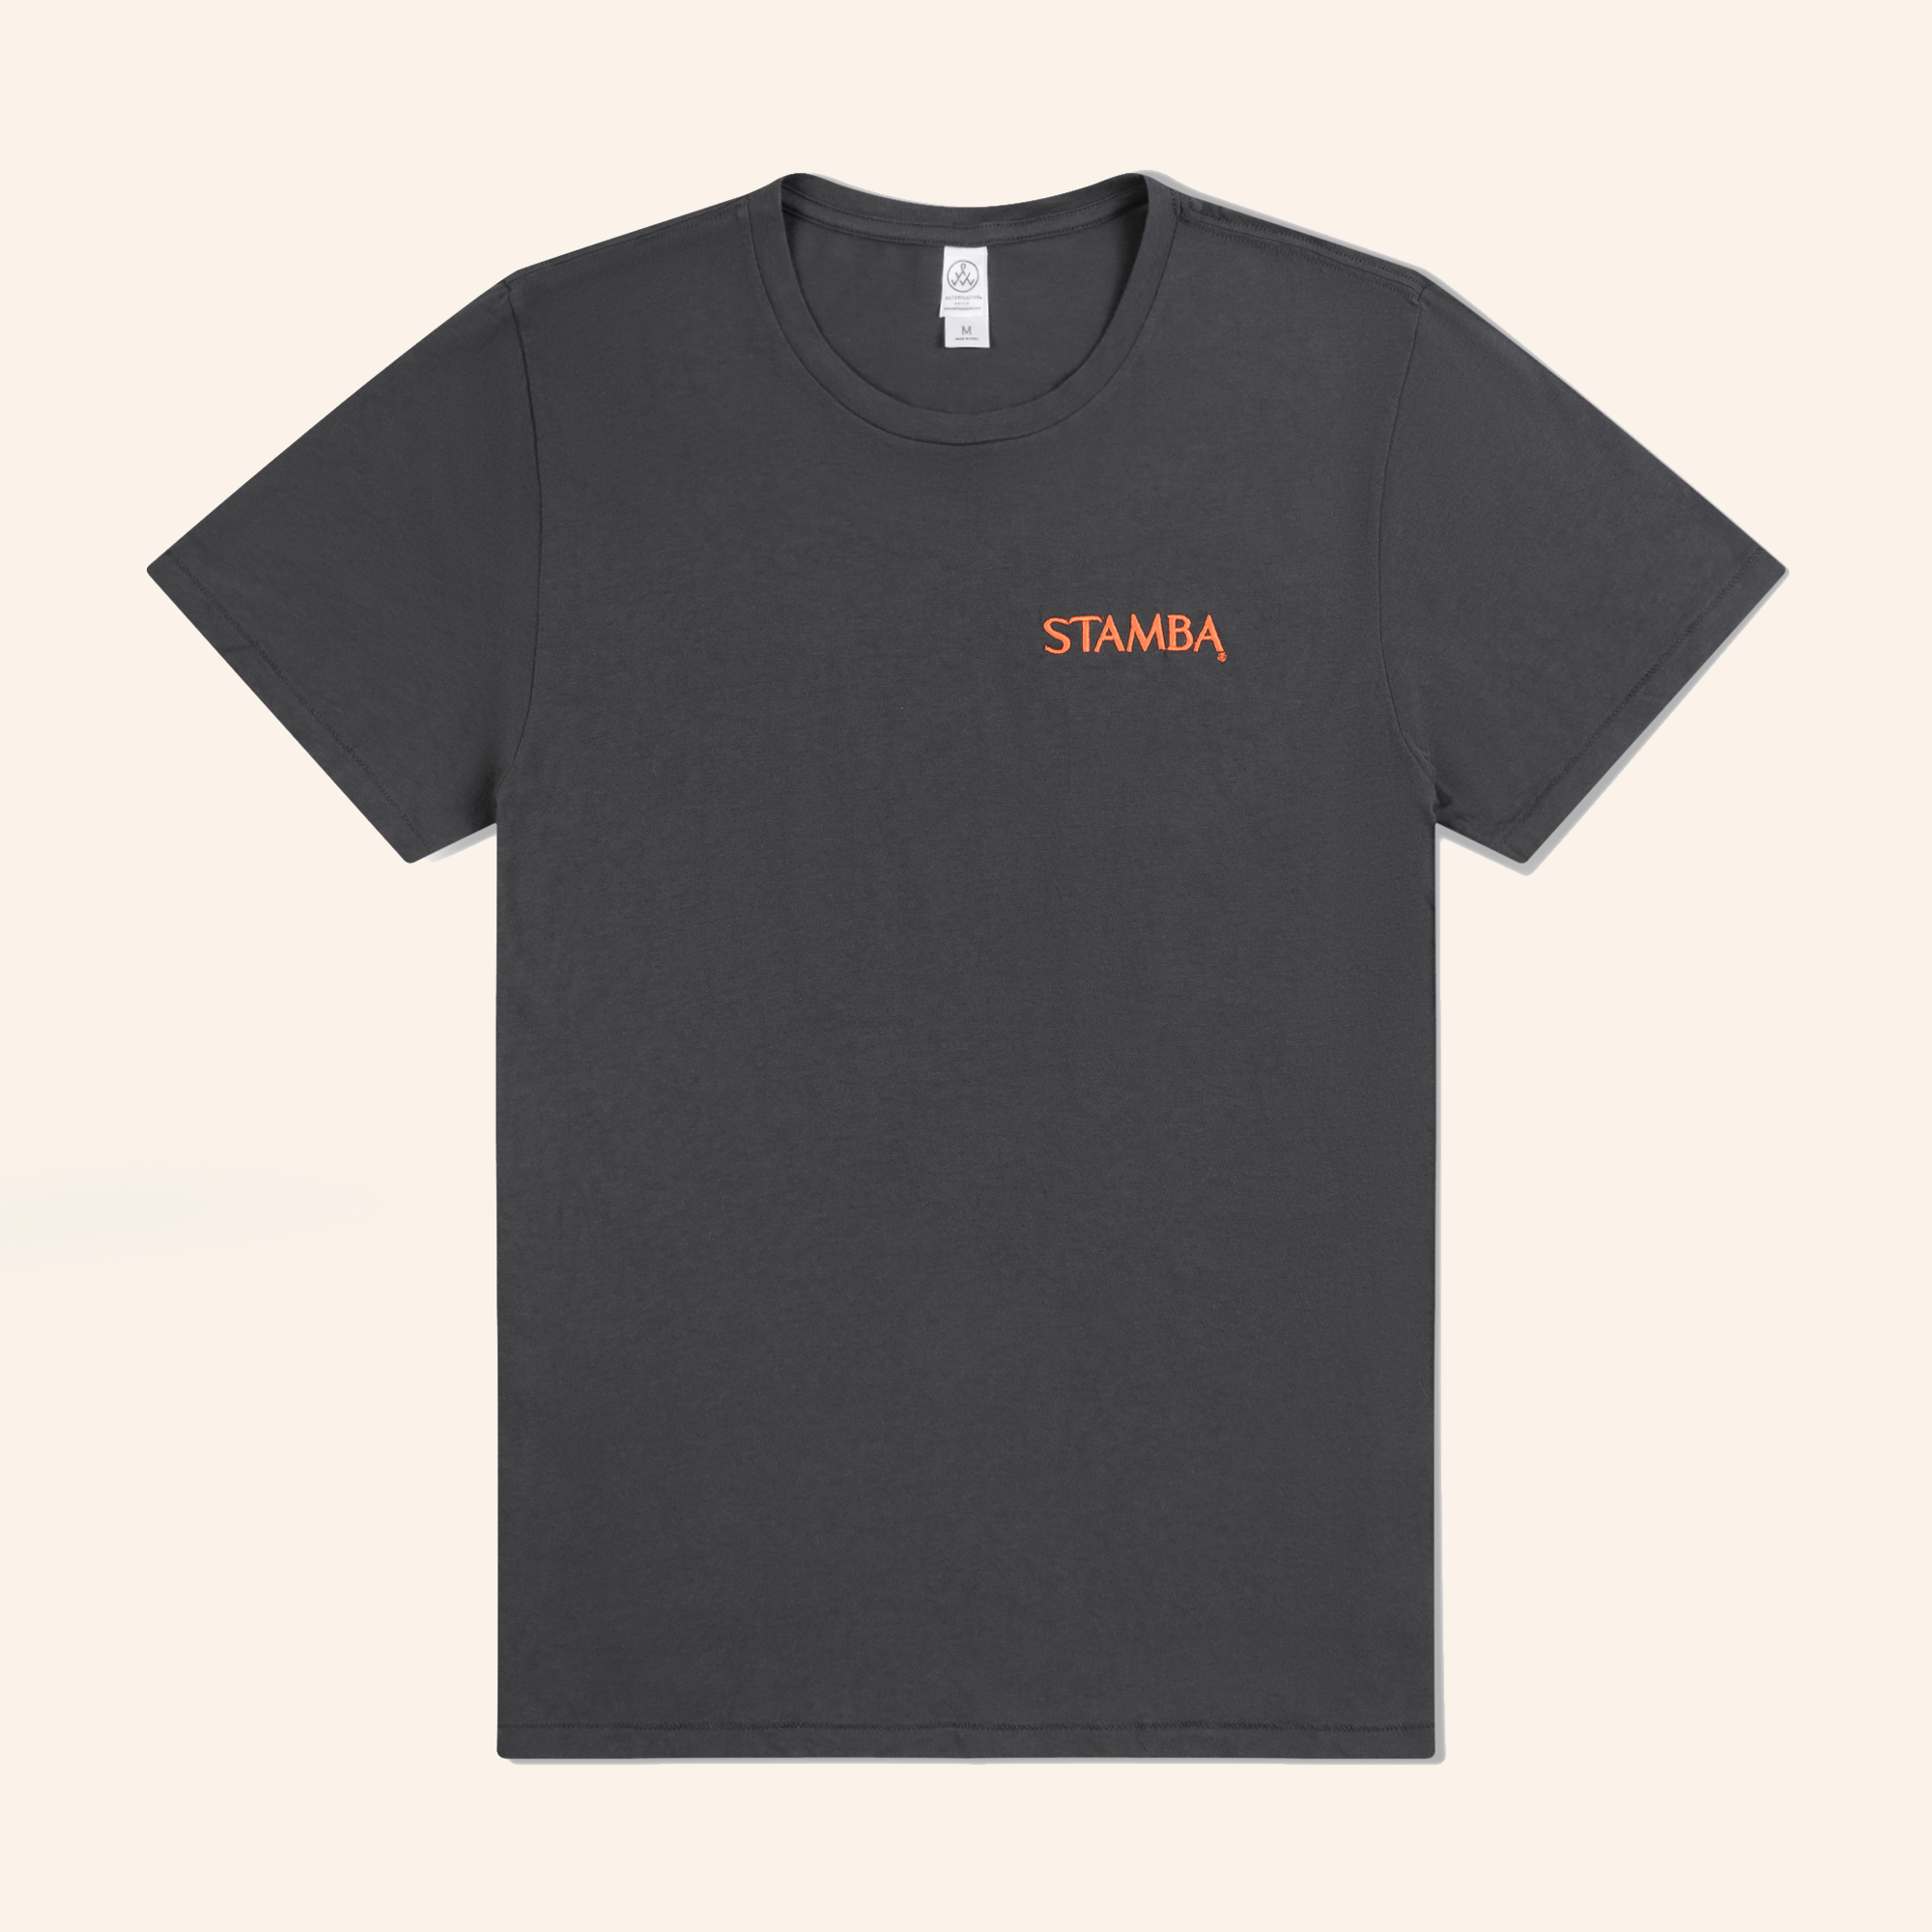 STAMBA Black shirt website.png